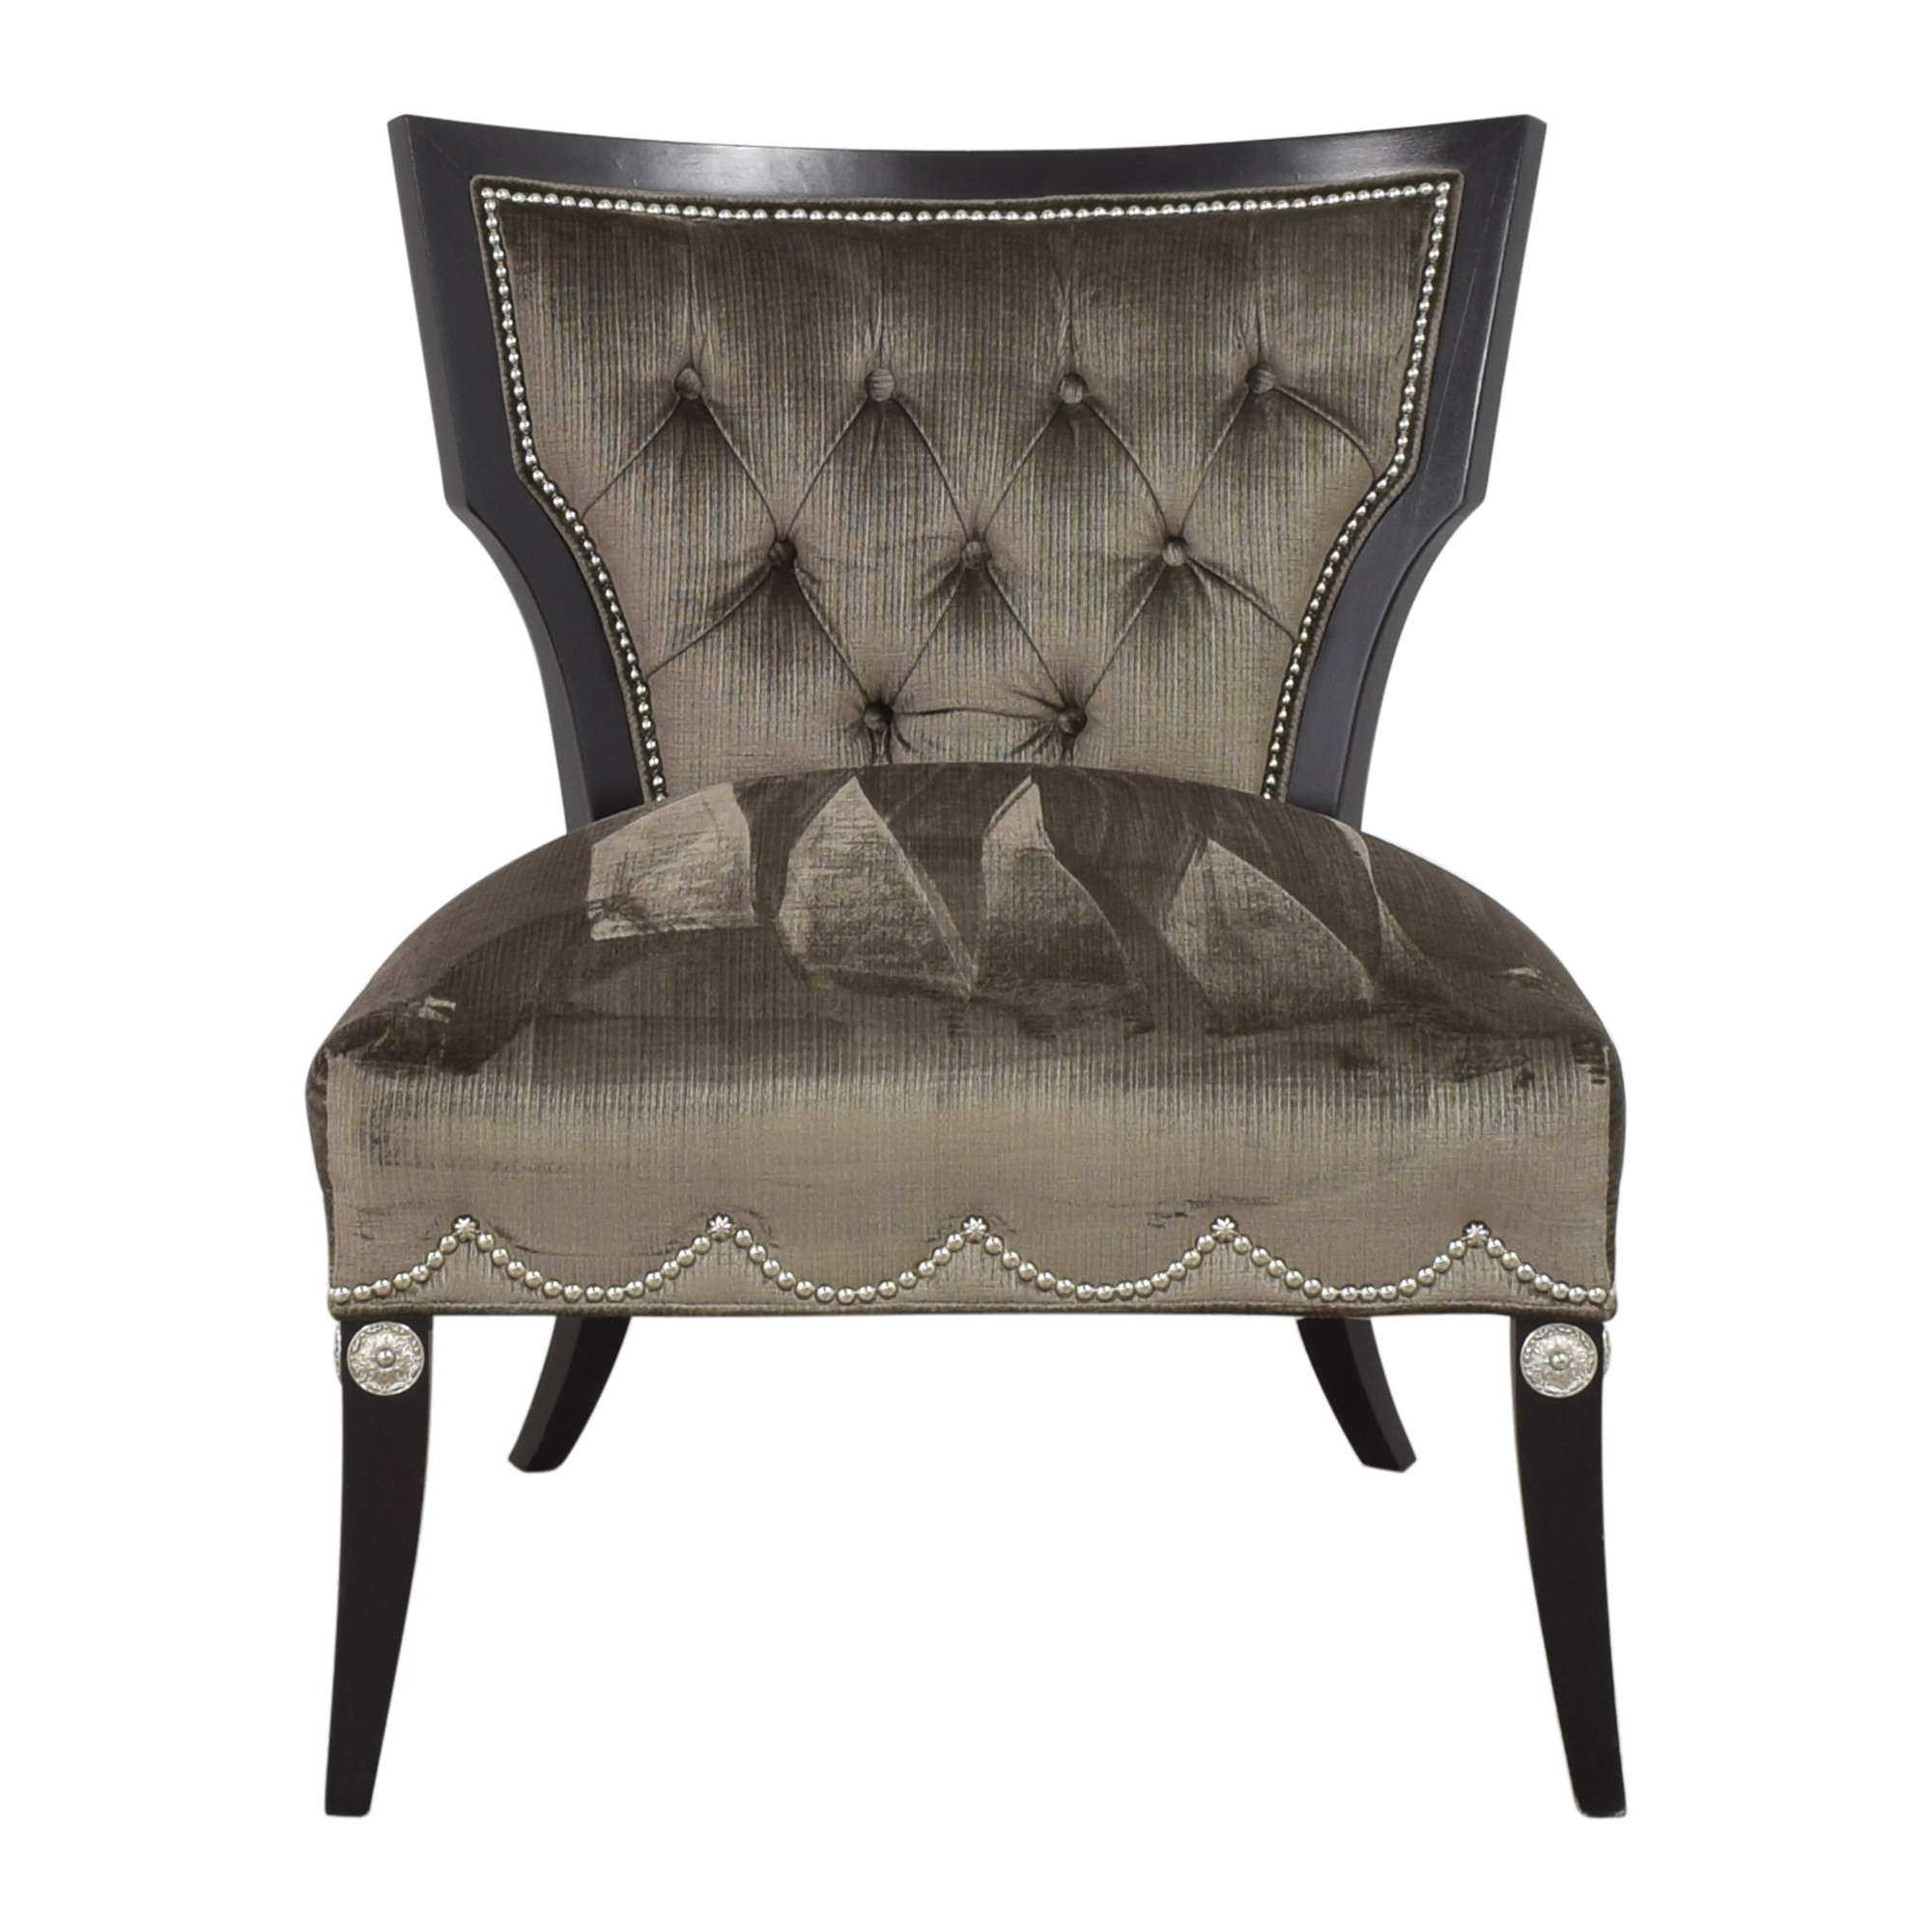 Lane Furniture Lane Furniture Nailhead Accent Chair on sale